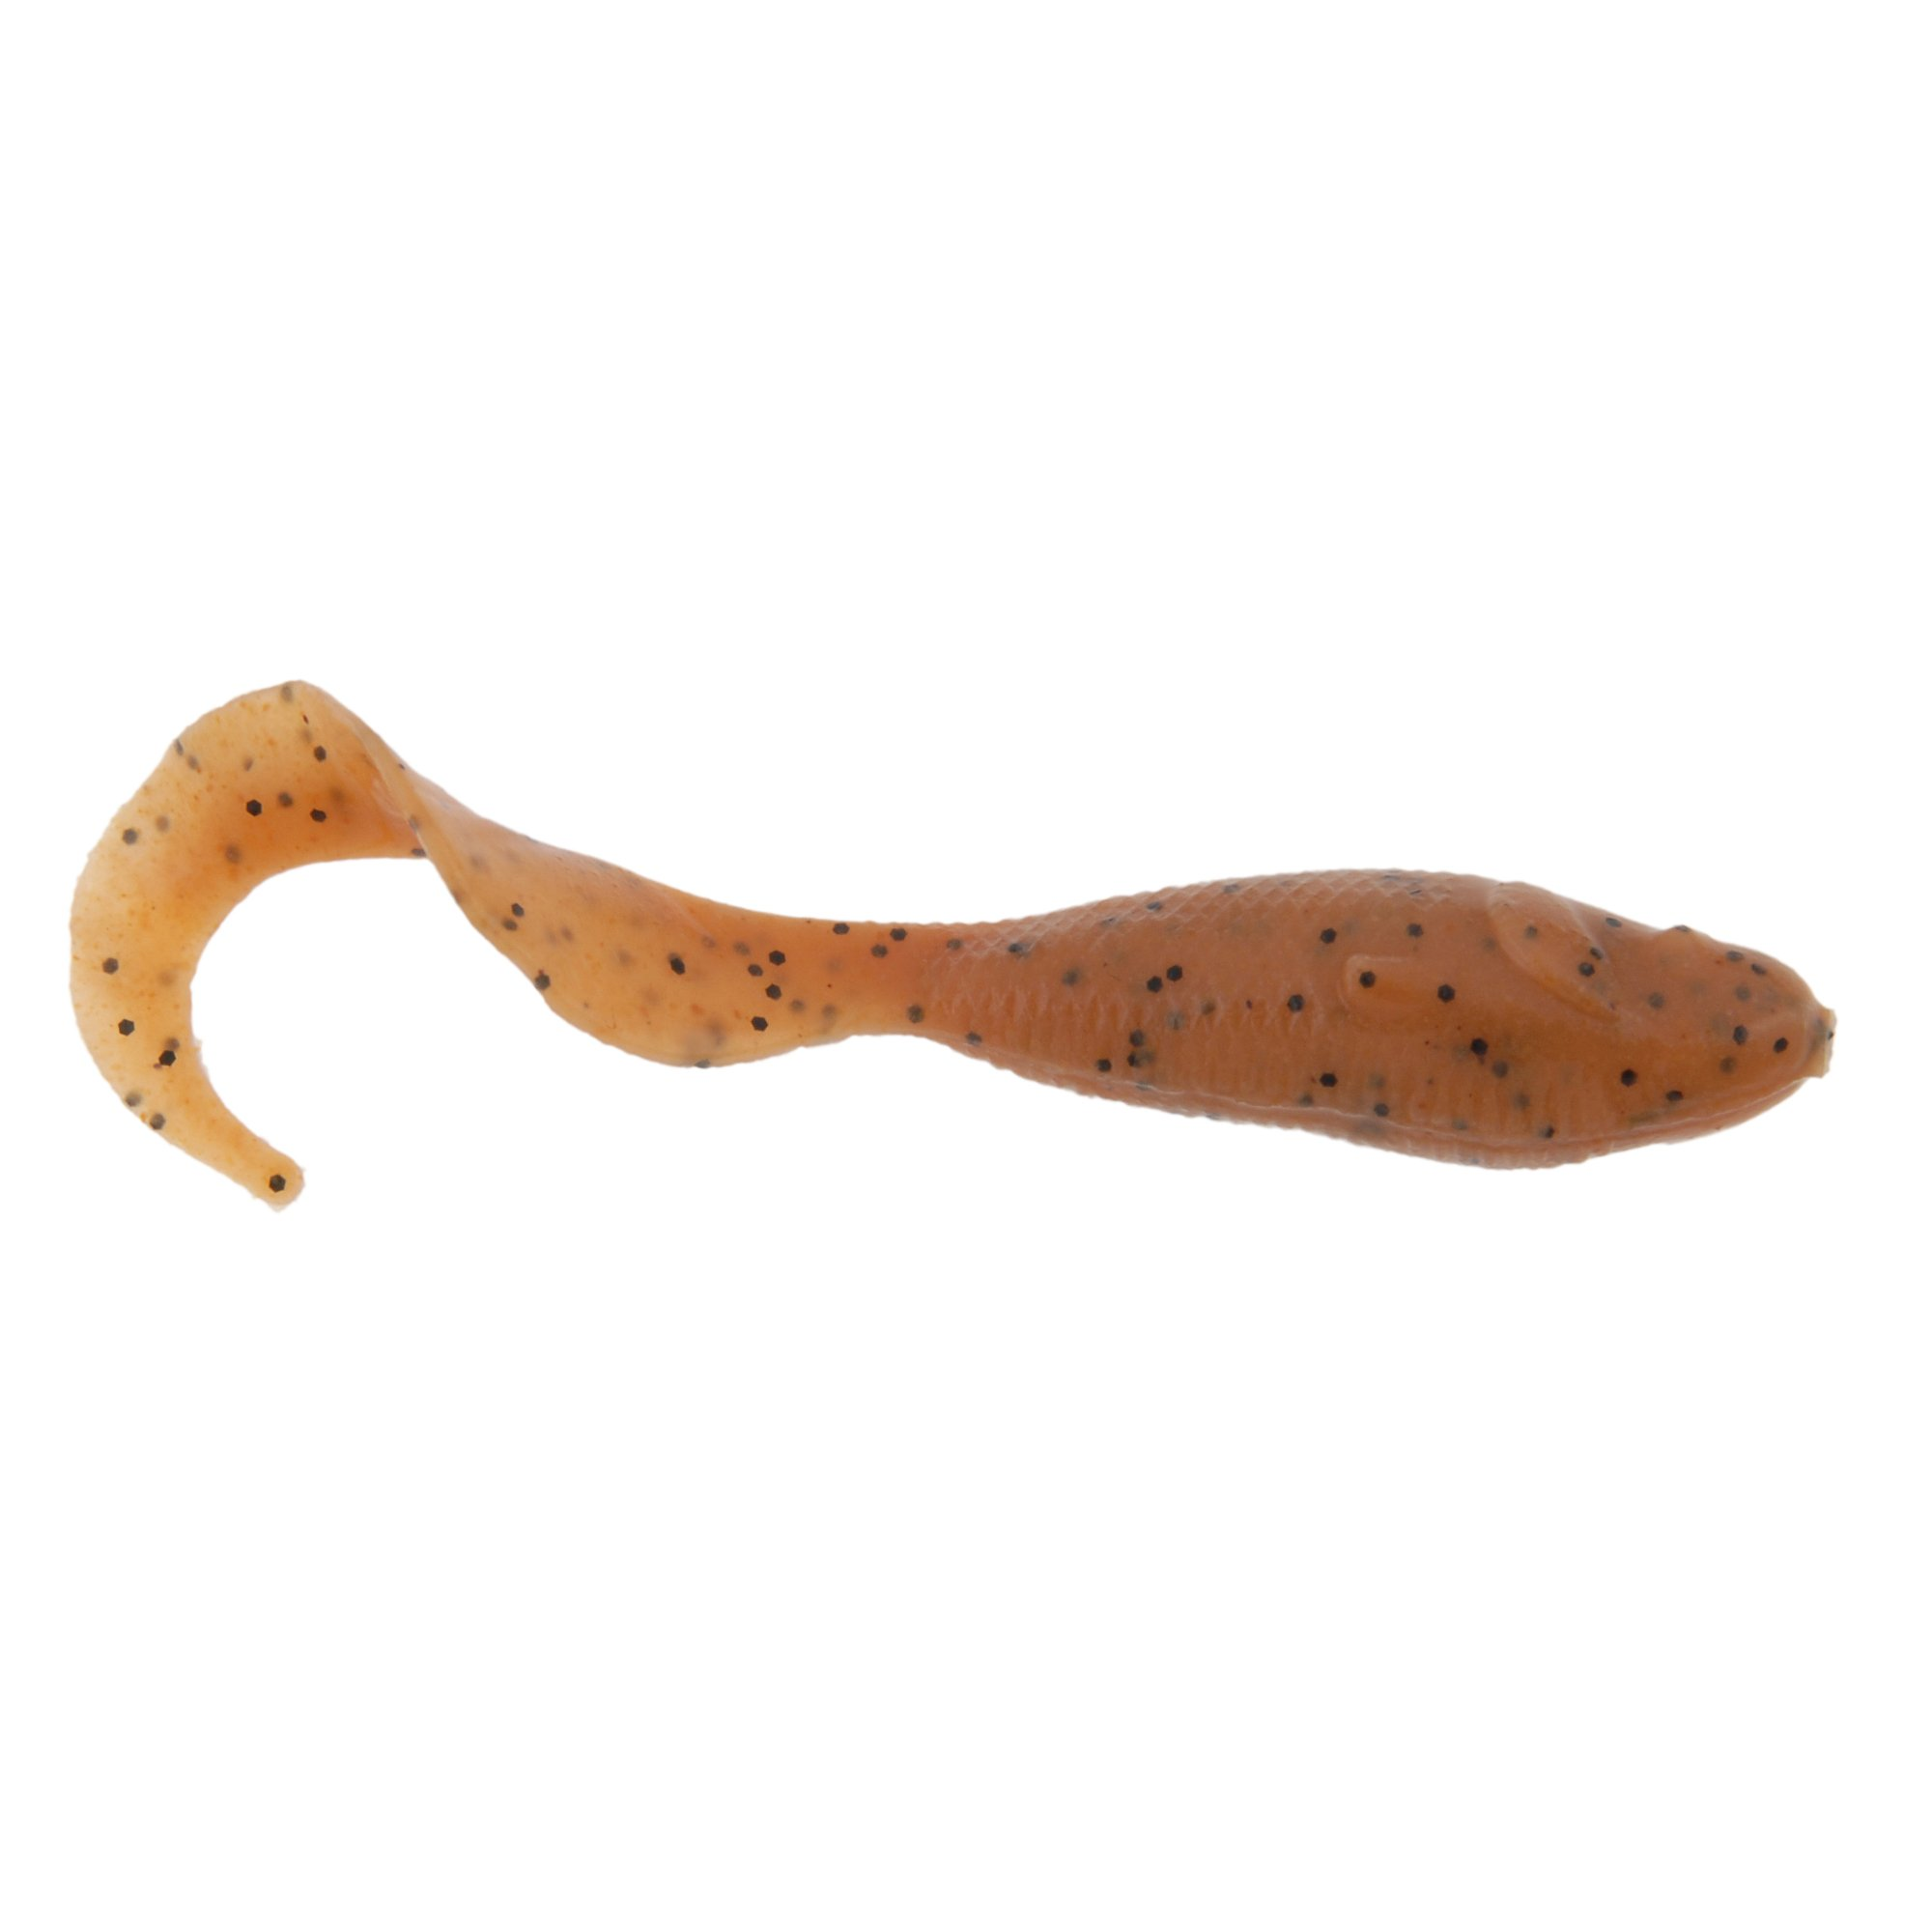 Berkley Gulp! Swimming Mullet Soft Bait - Pumpkinseed - 3in   8cm - Inshore by Berkley